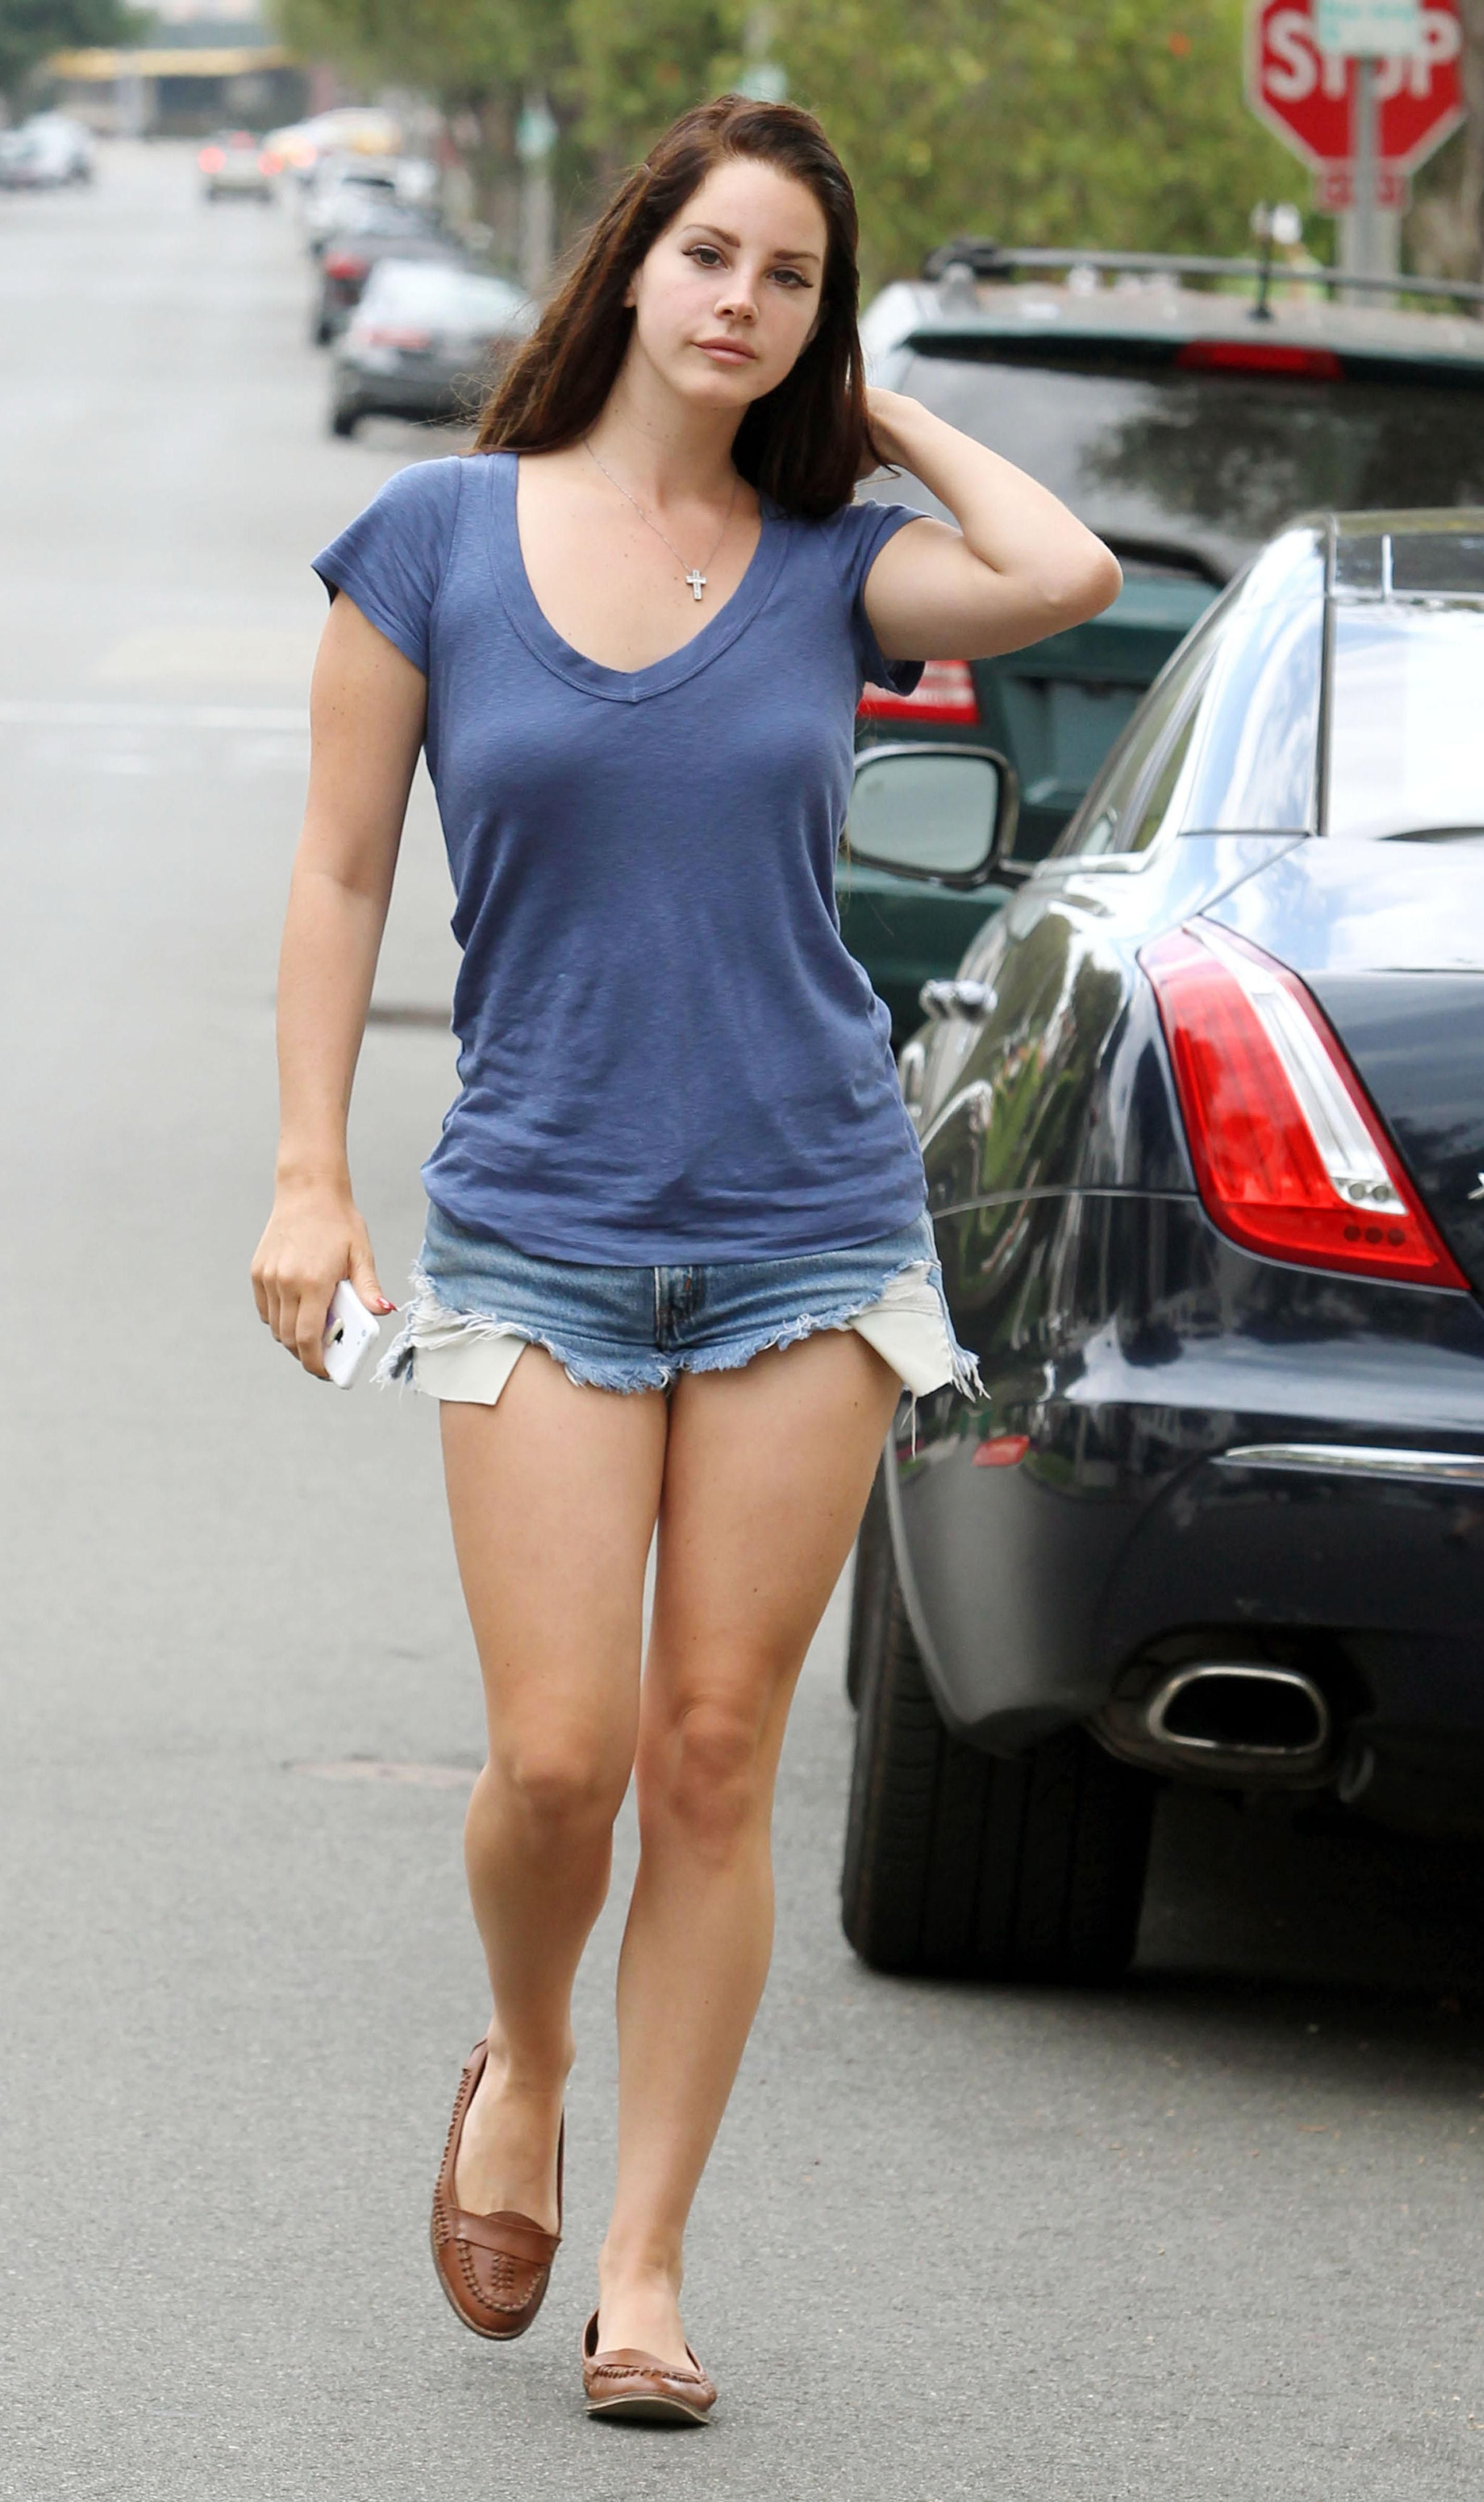 Tits Lena Dunham naked (15 photos), Ass, Paparazzi, Twitter, underwear 2019